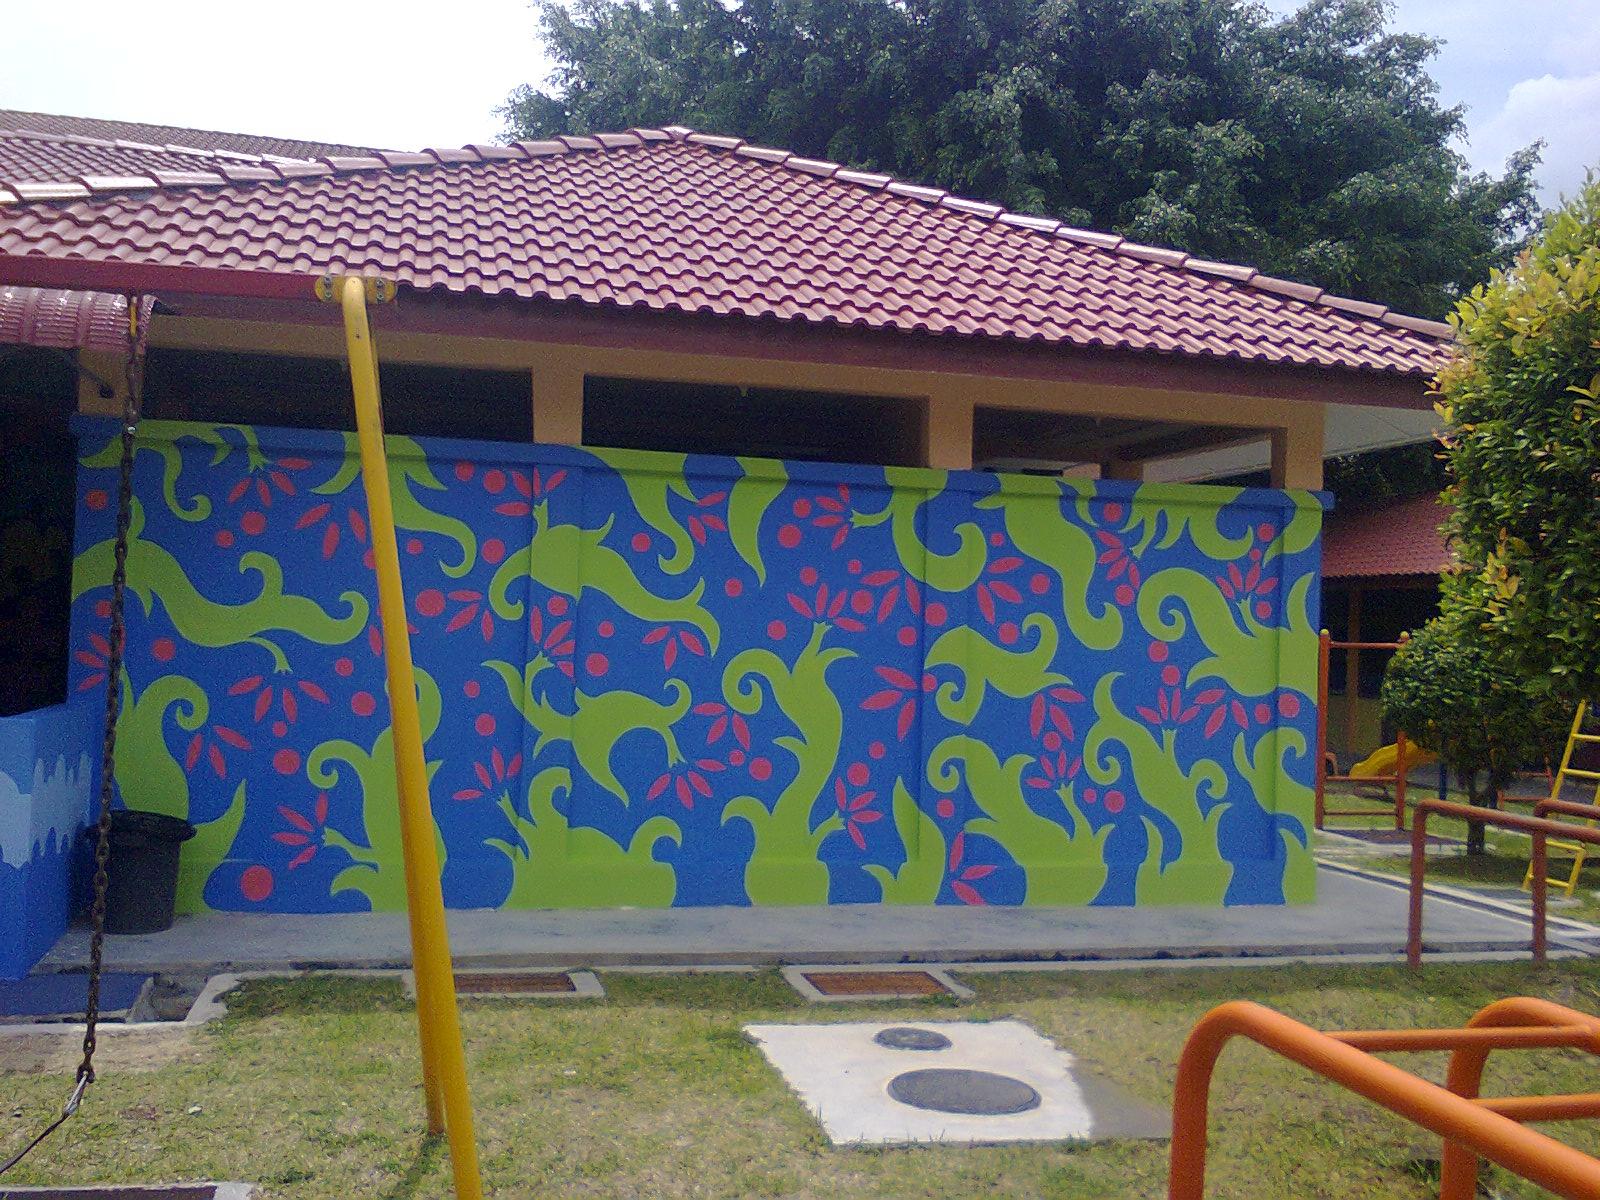 Hayat paintmaster october 2012 for Contoh lukisan mural tadika